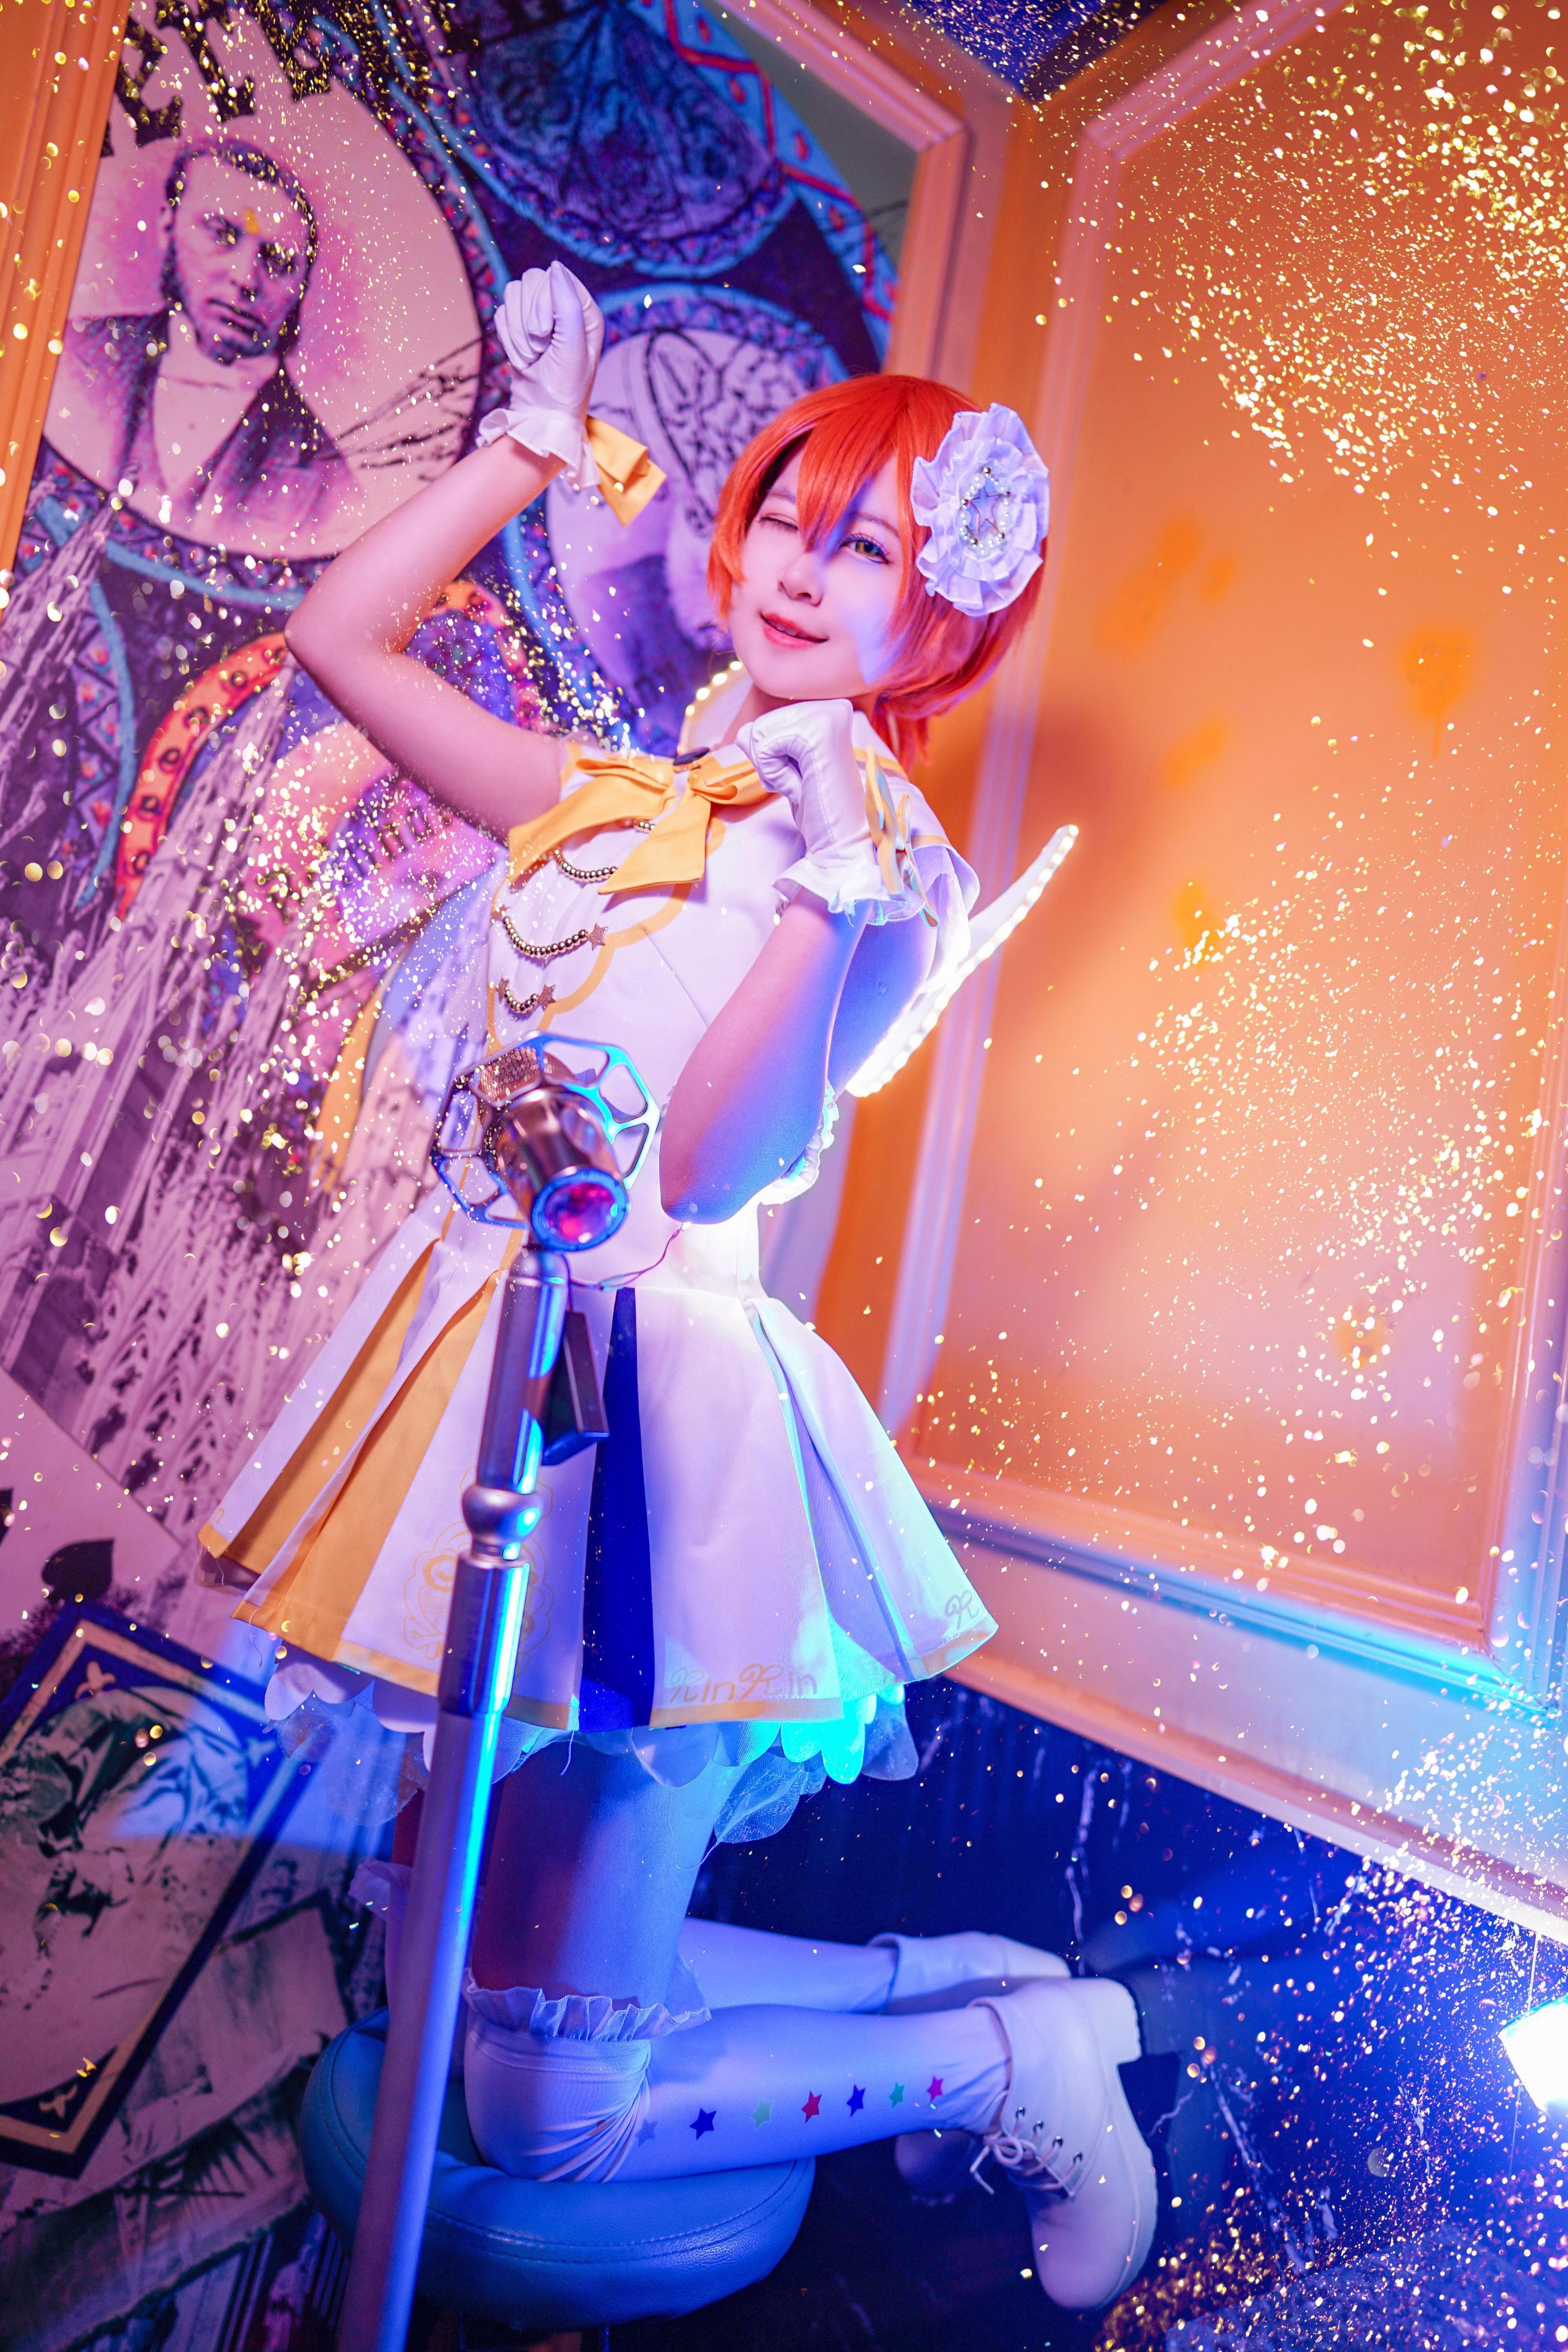 《LOVE LIVE!》少女cosplay【CN:_李笑颜Lee】-第1张